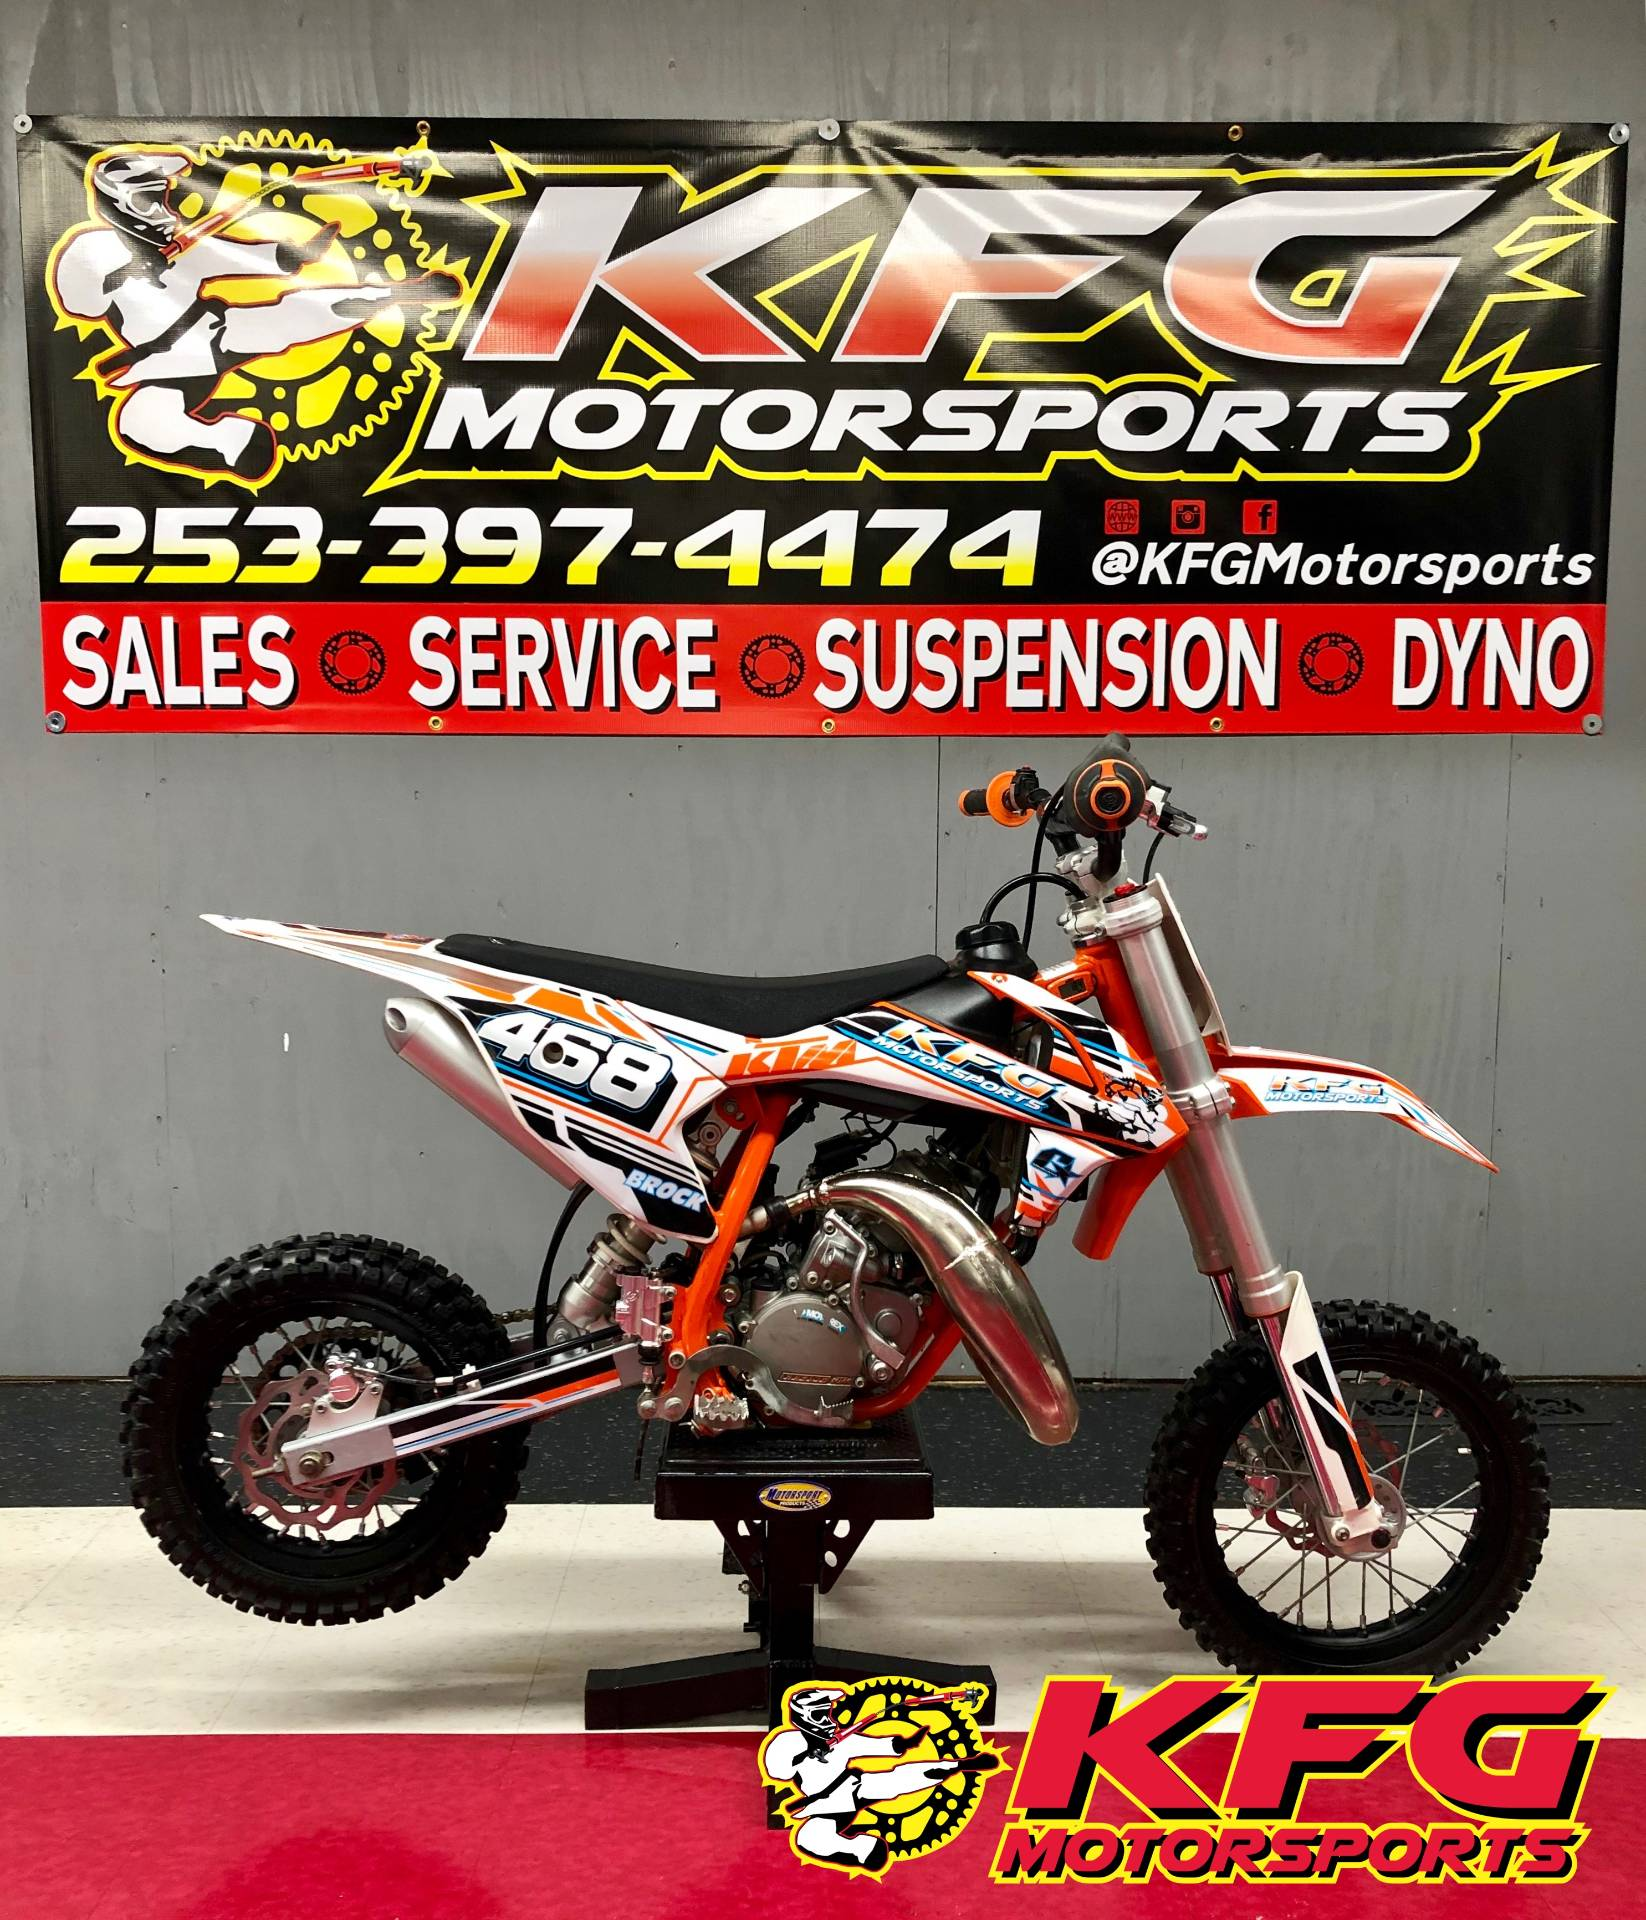 2018 KTM 50 SX in Auburn, Washington